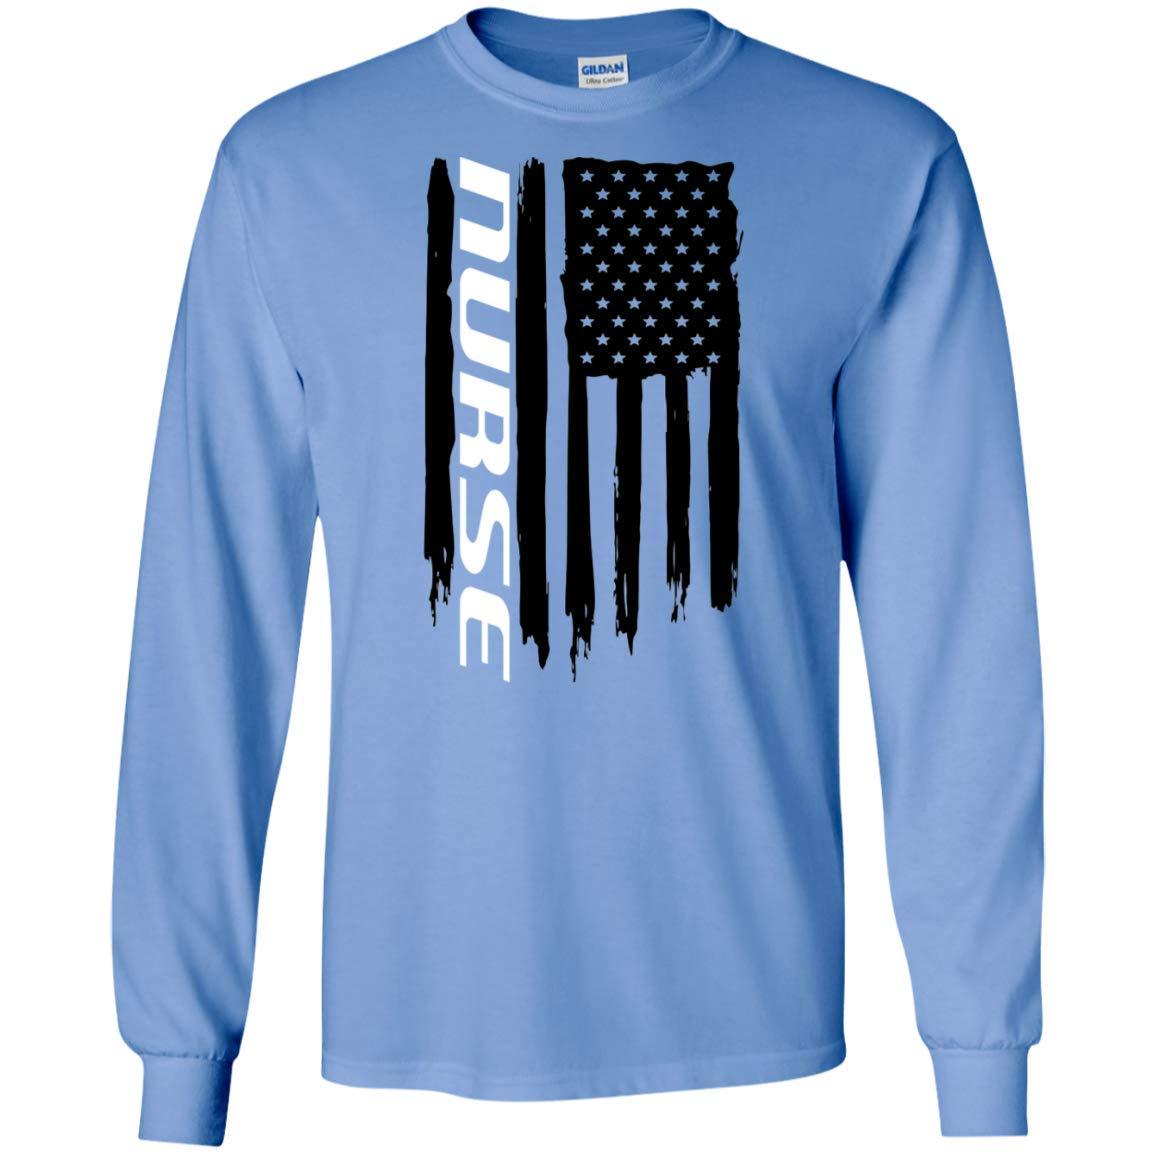 Nurse Nursing RN Medical American Flag T-Shirt